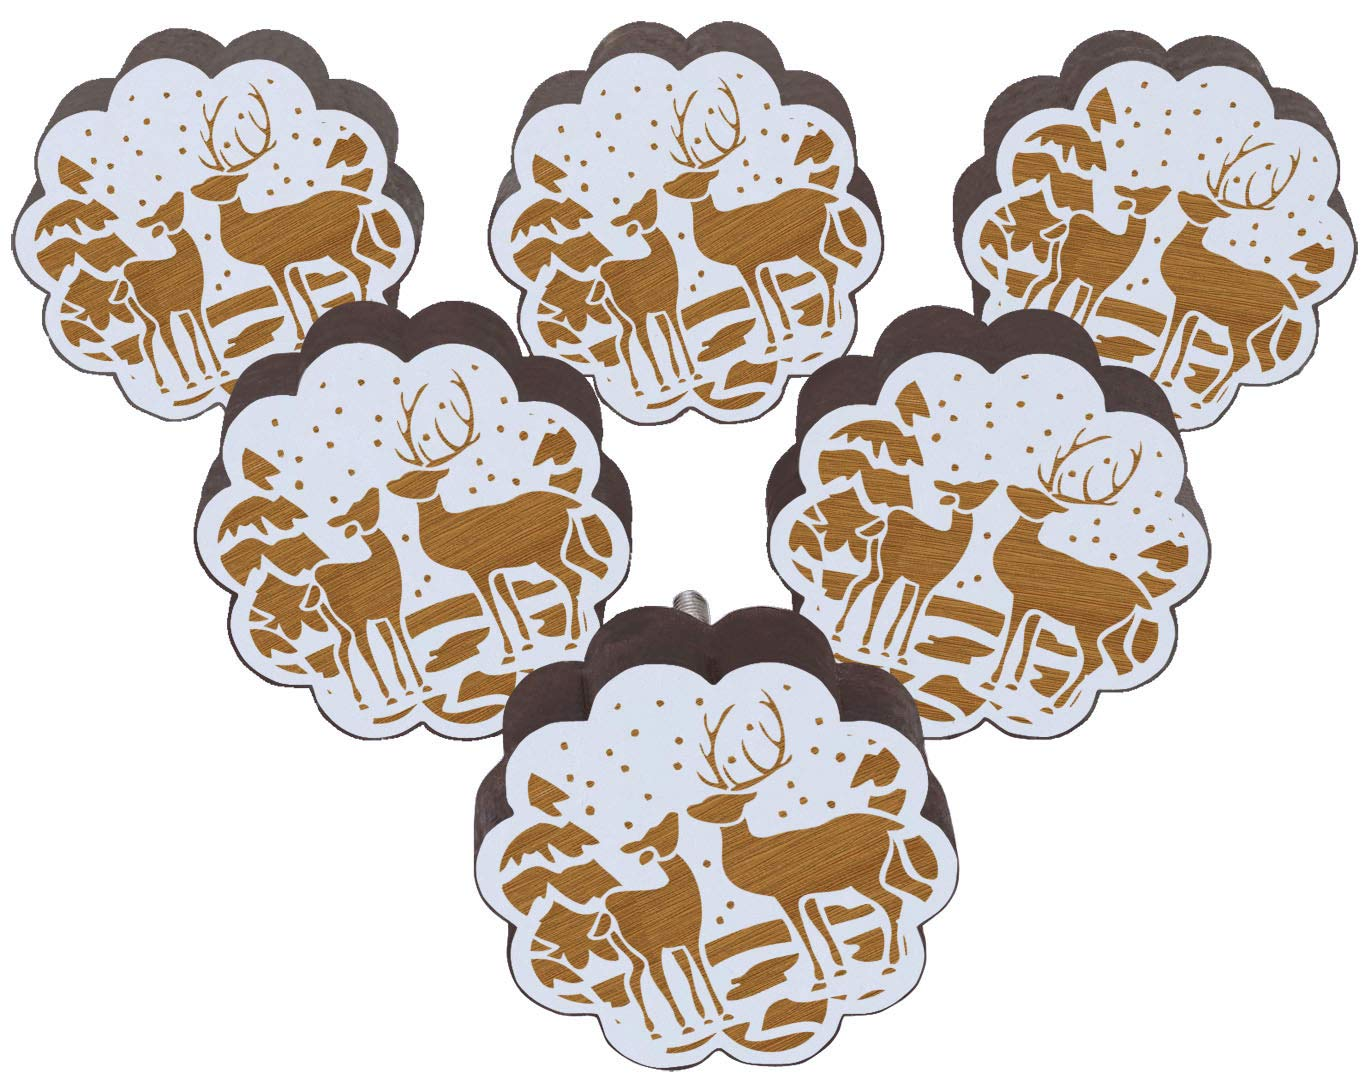 IBA Indianbeautifulart White Christmas Deer Engraved Pack of 10 Wooden Wardrobe Door Knobs Drawer Pull MW-903095-IBA-EG-WDNTEH14B-HEPTAGON